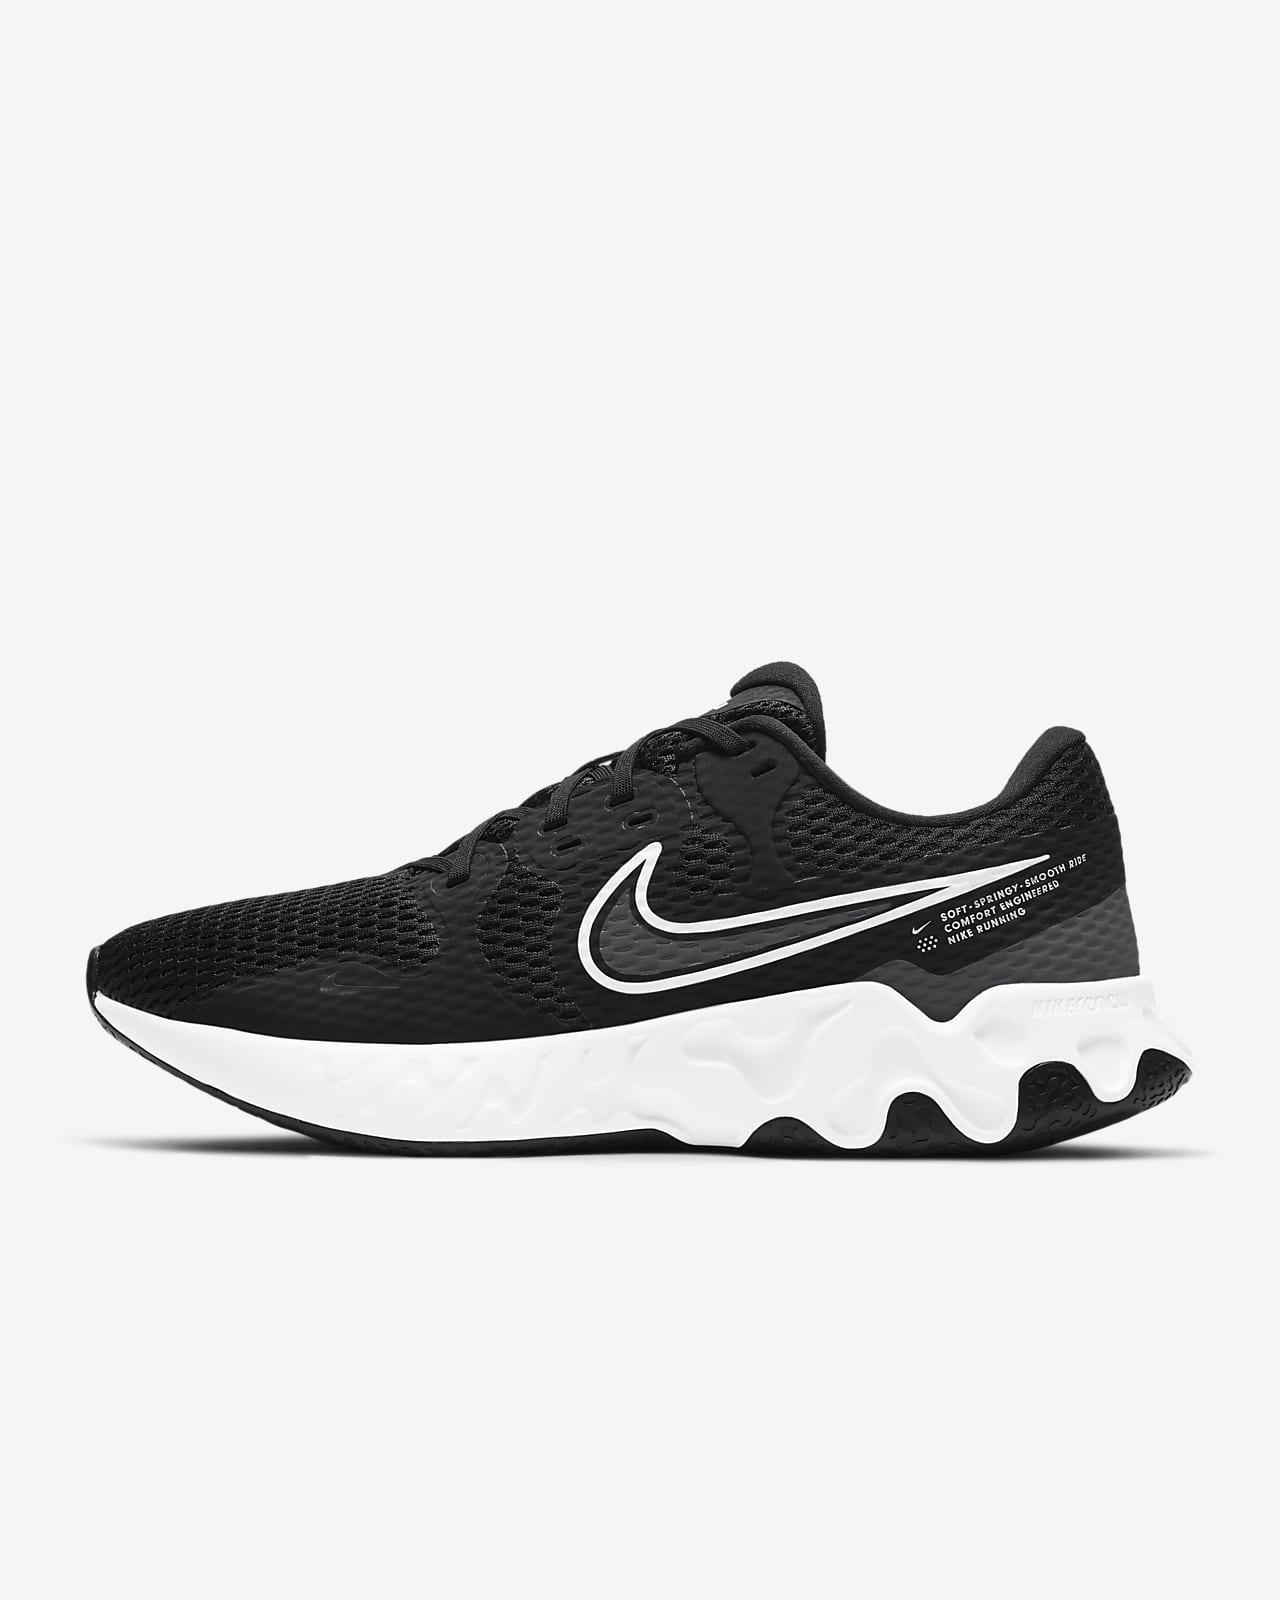 Calzado de running en carretera para hombre Nike Renew Ride 2